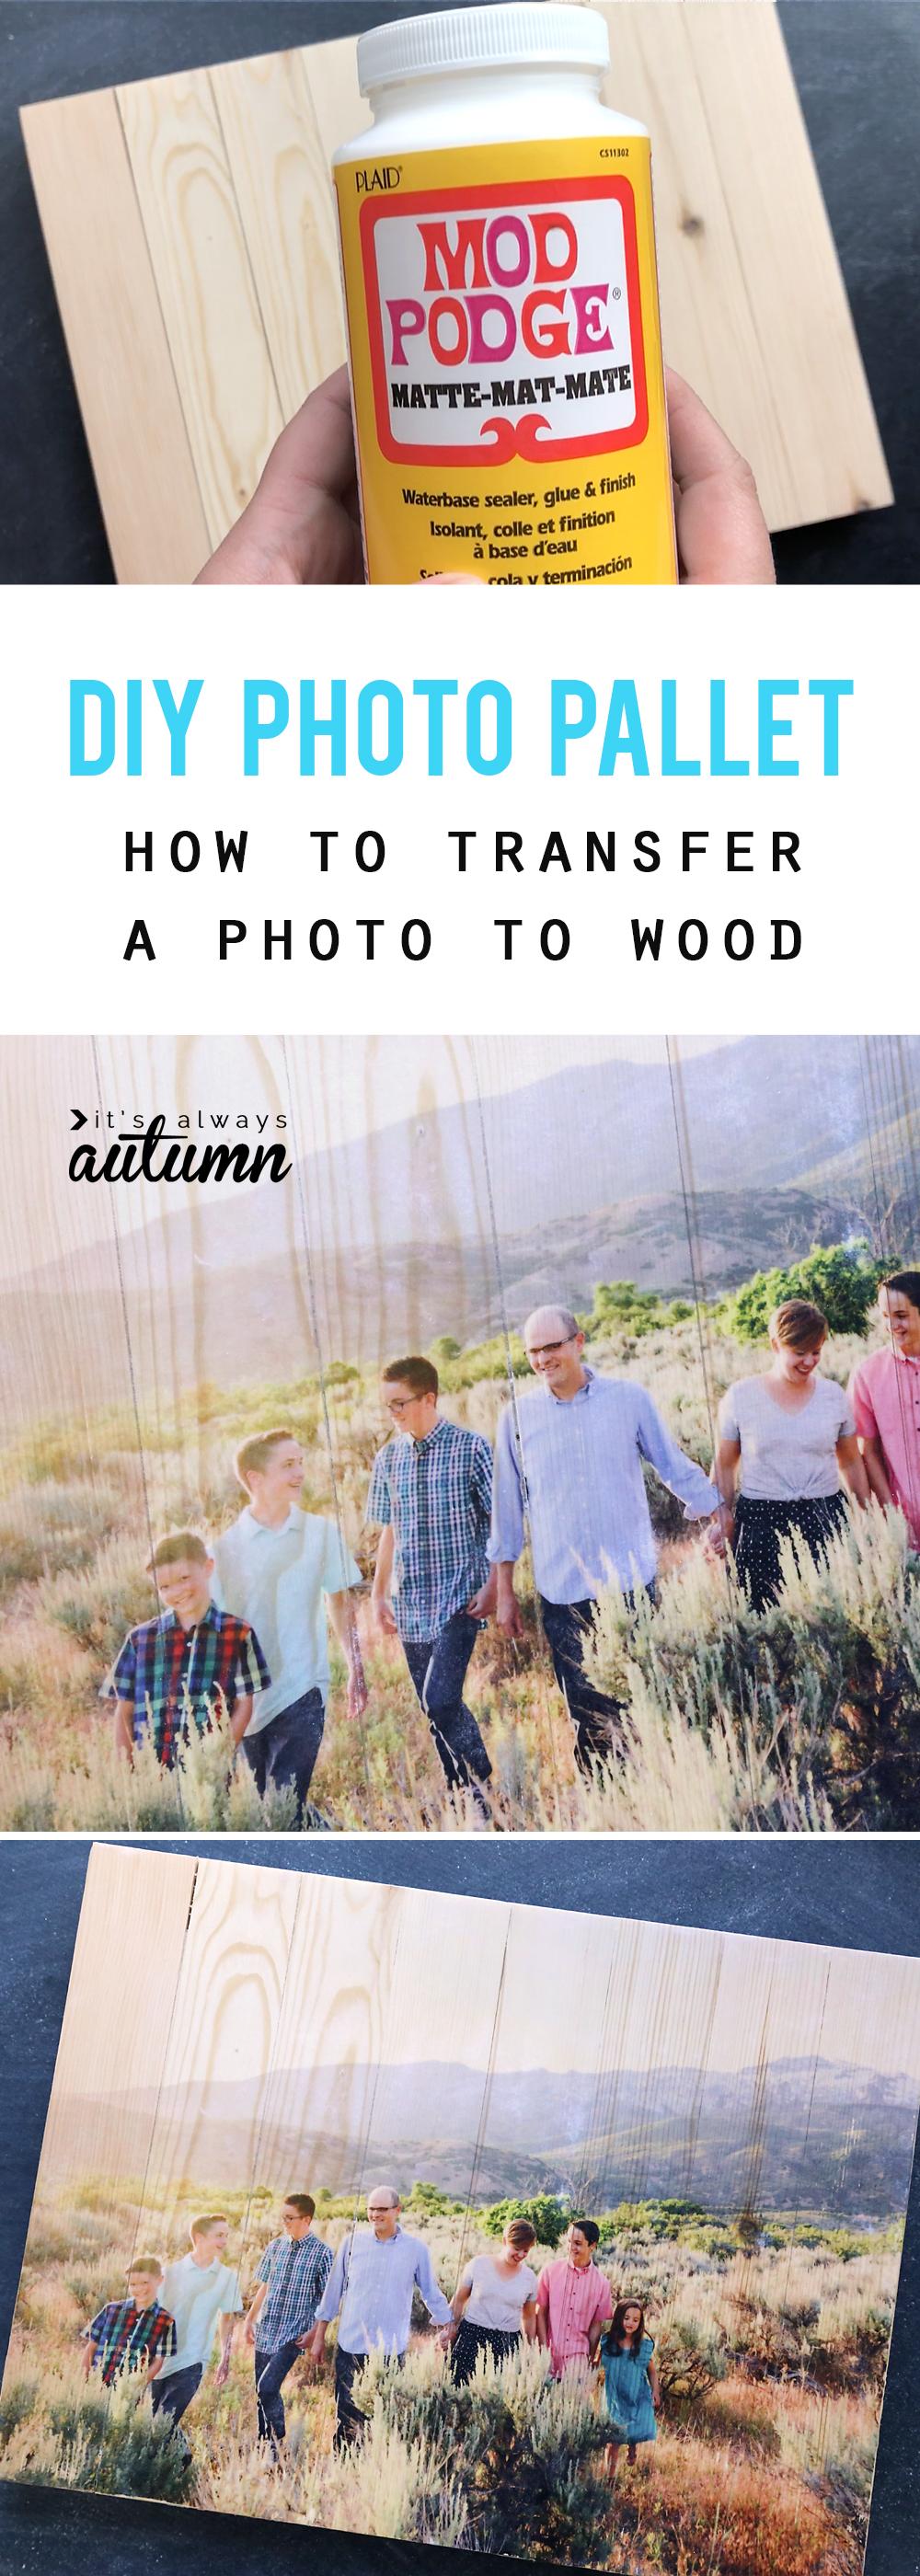 Mod Podge, family photo transferred onto wood